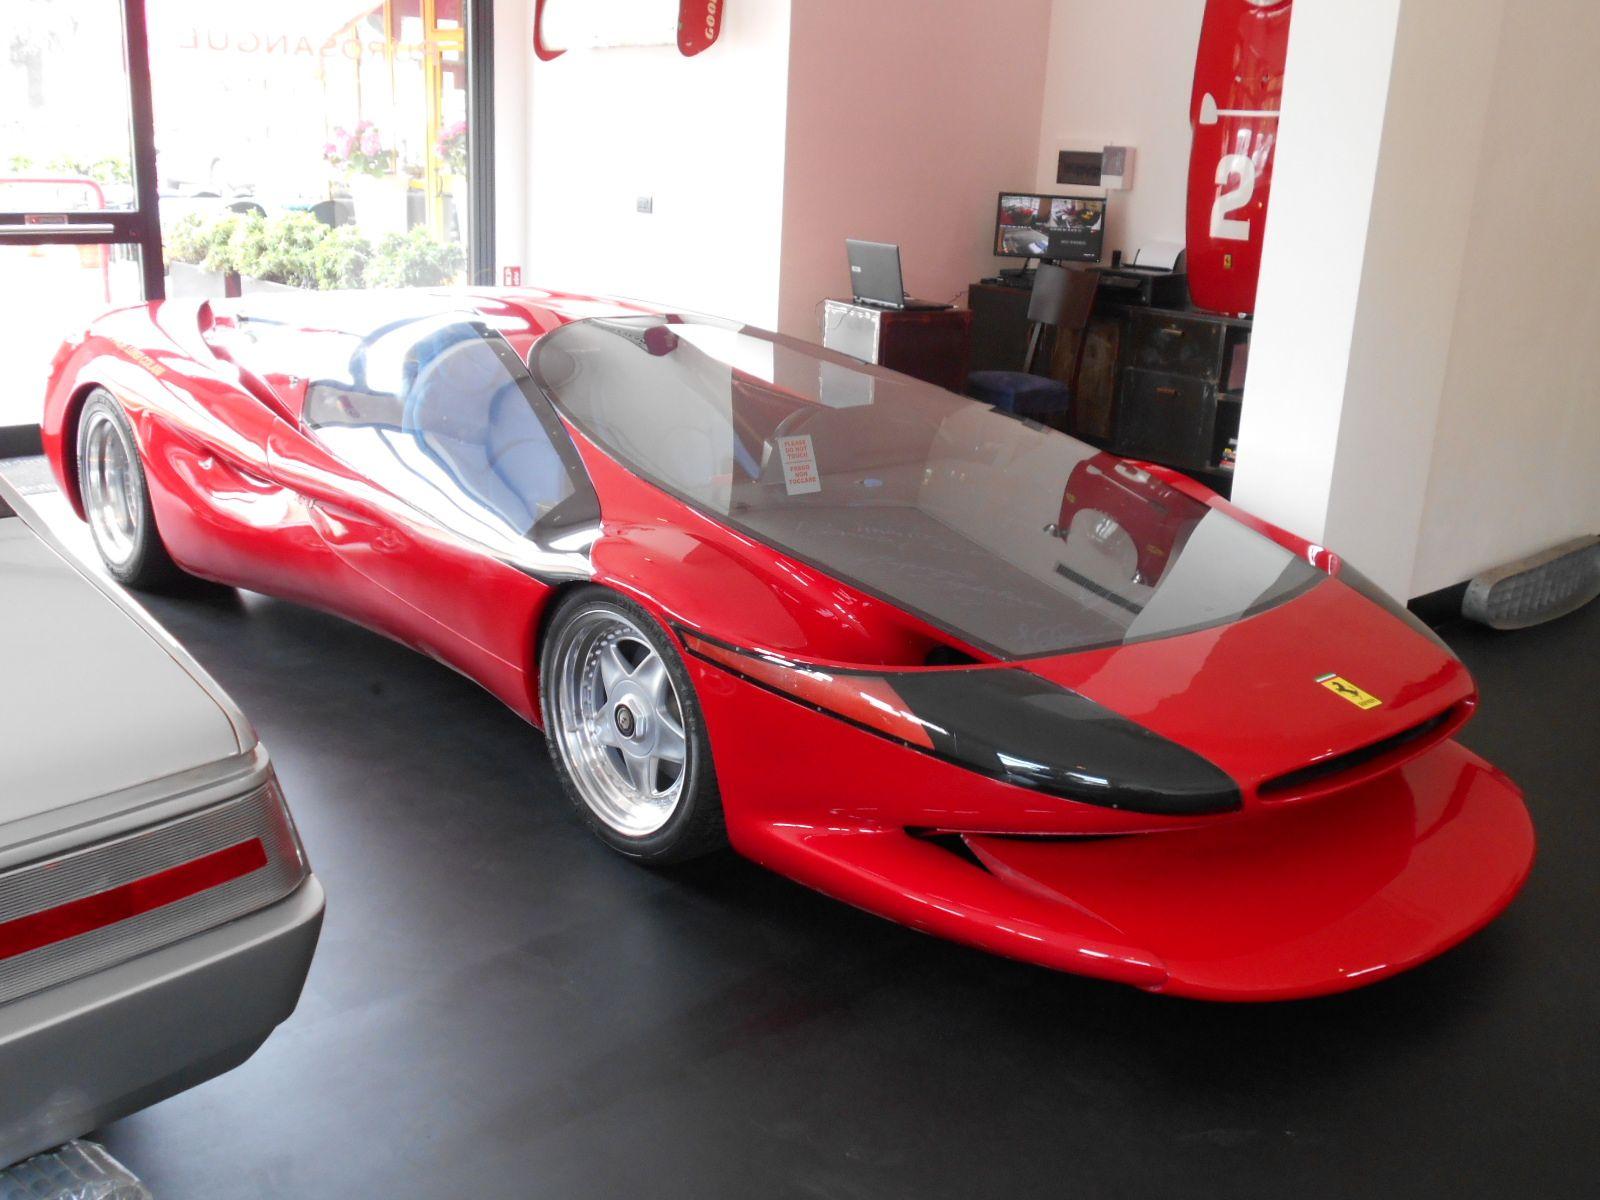 b11a0a7c11b212cc3b0fbe74cab186a3 Fabulous Ferrari Mondial T In Vendita Cars Trend